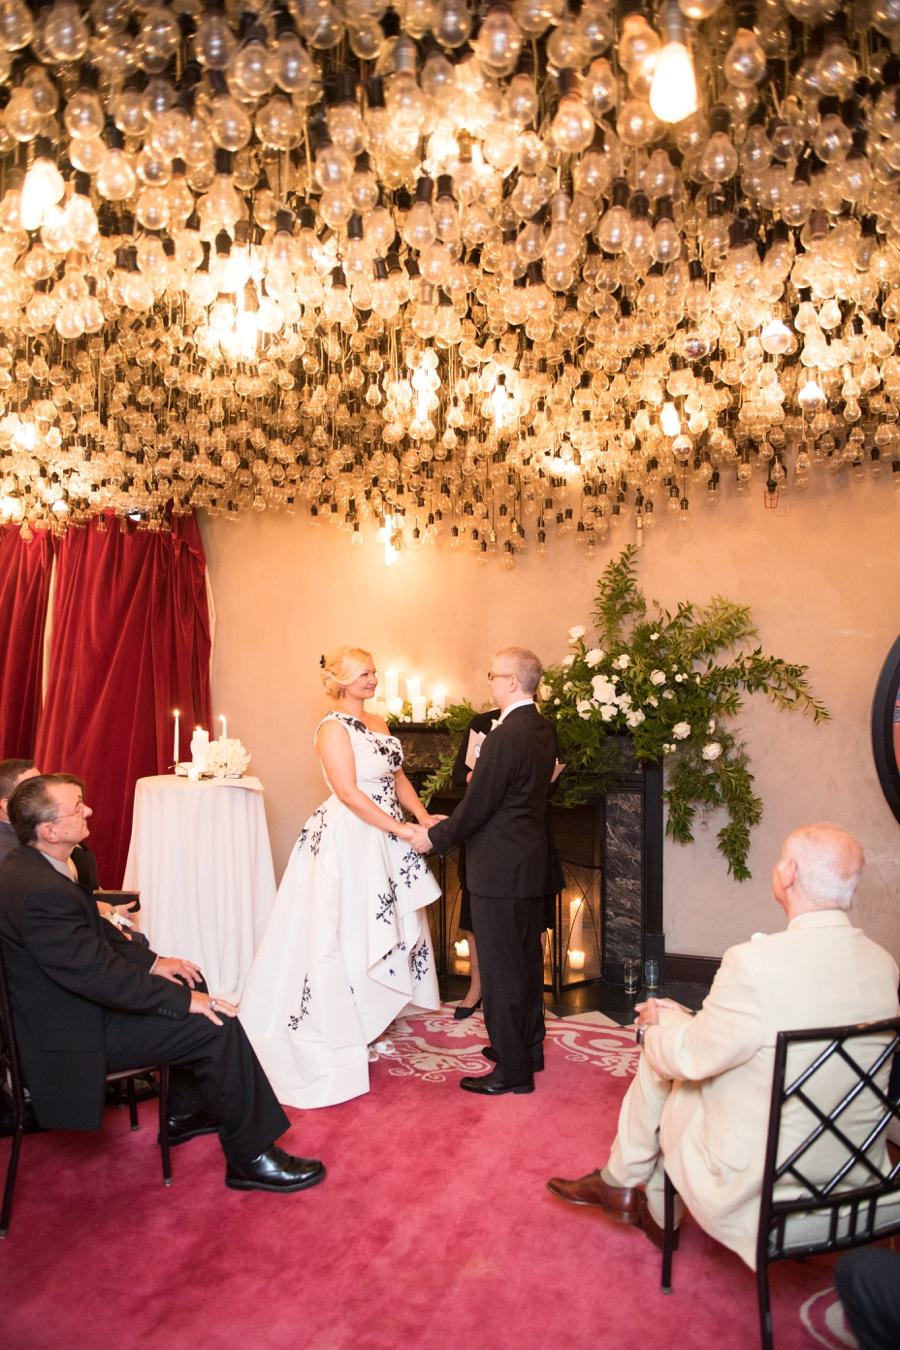 Gramercy_Park_Hotel_Wedding_NYC_DJ_17.jpg